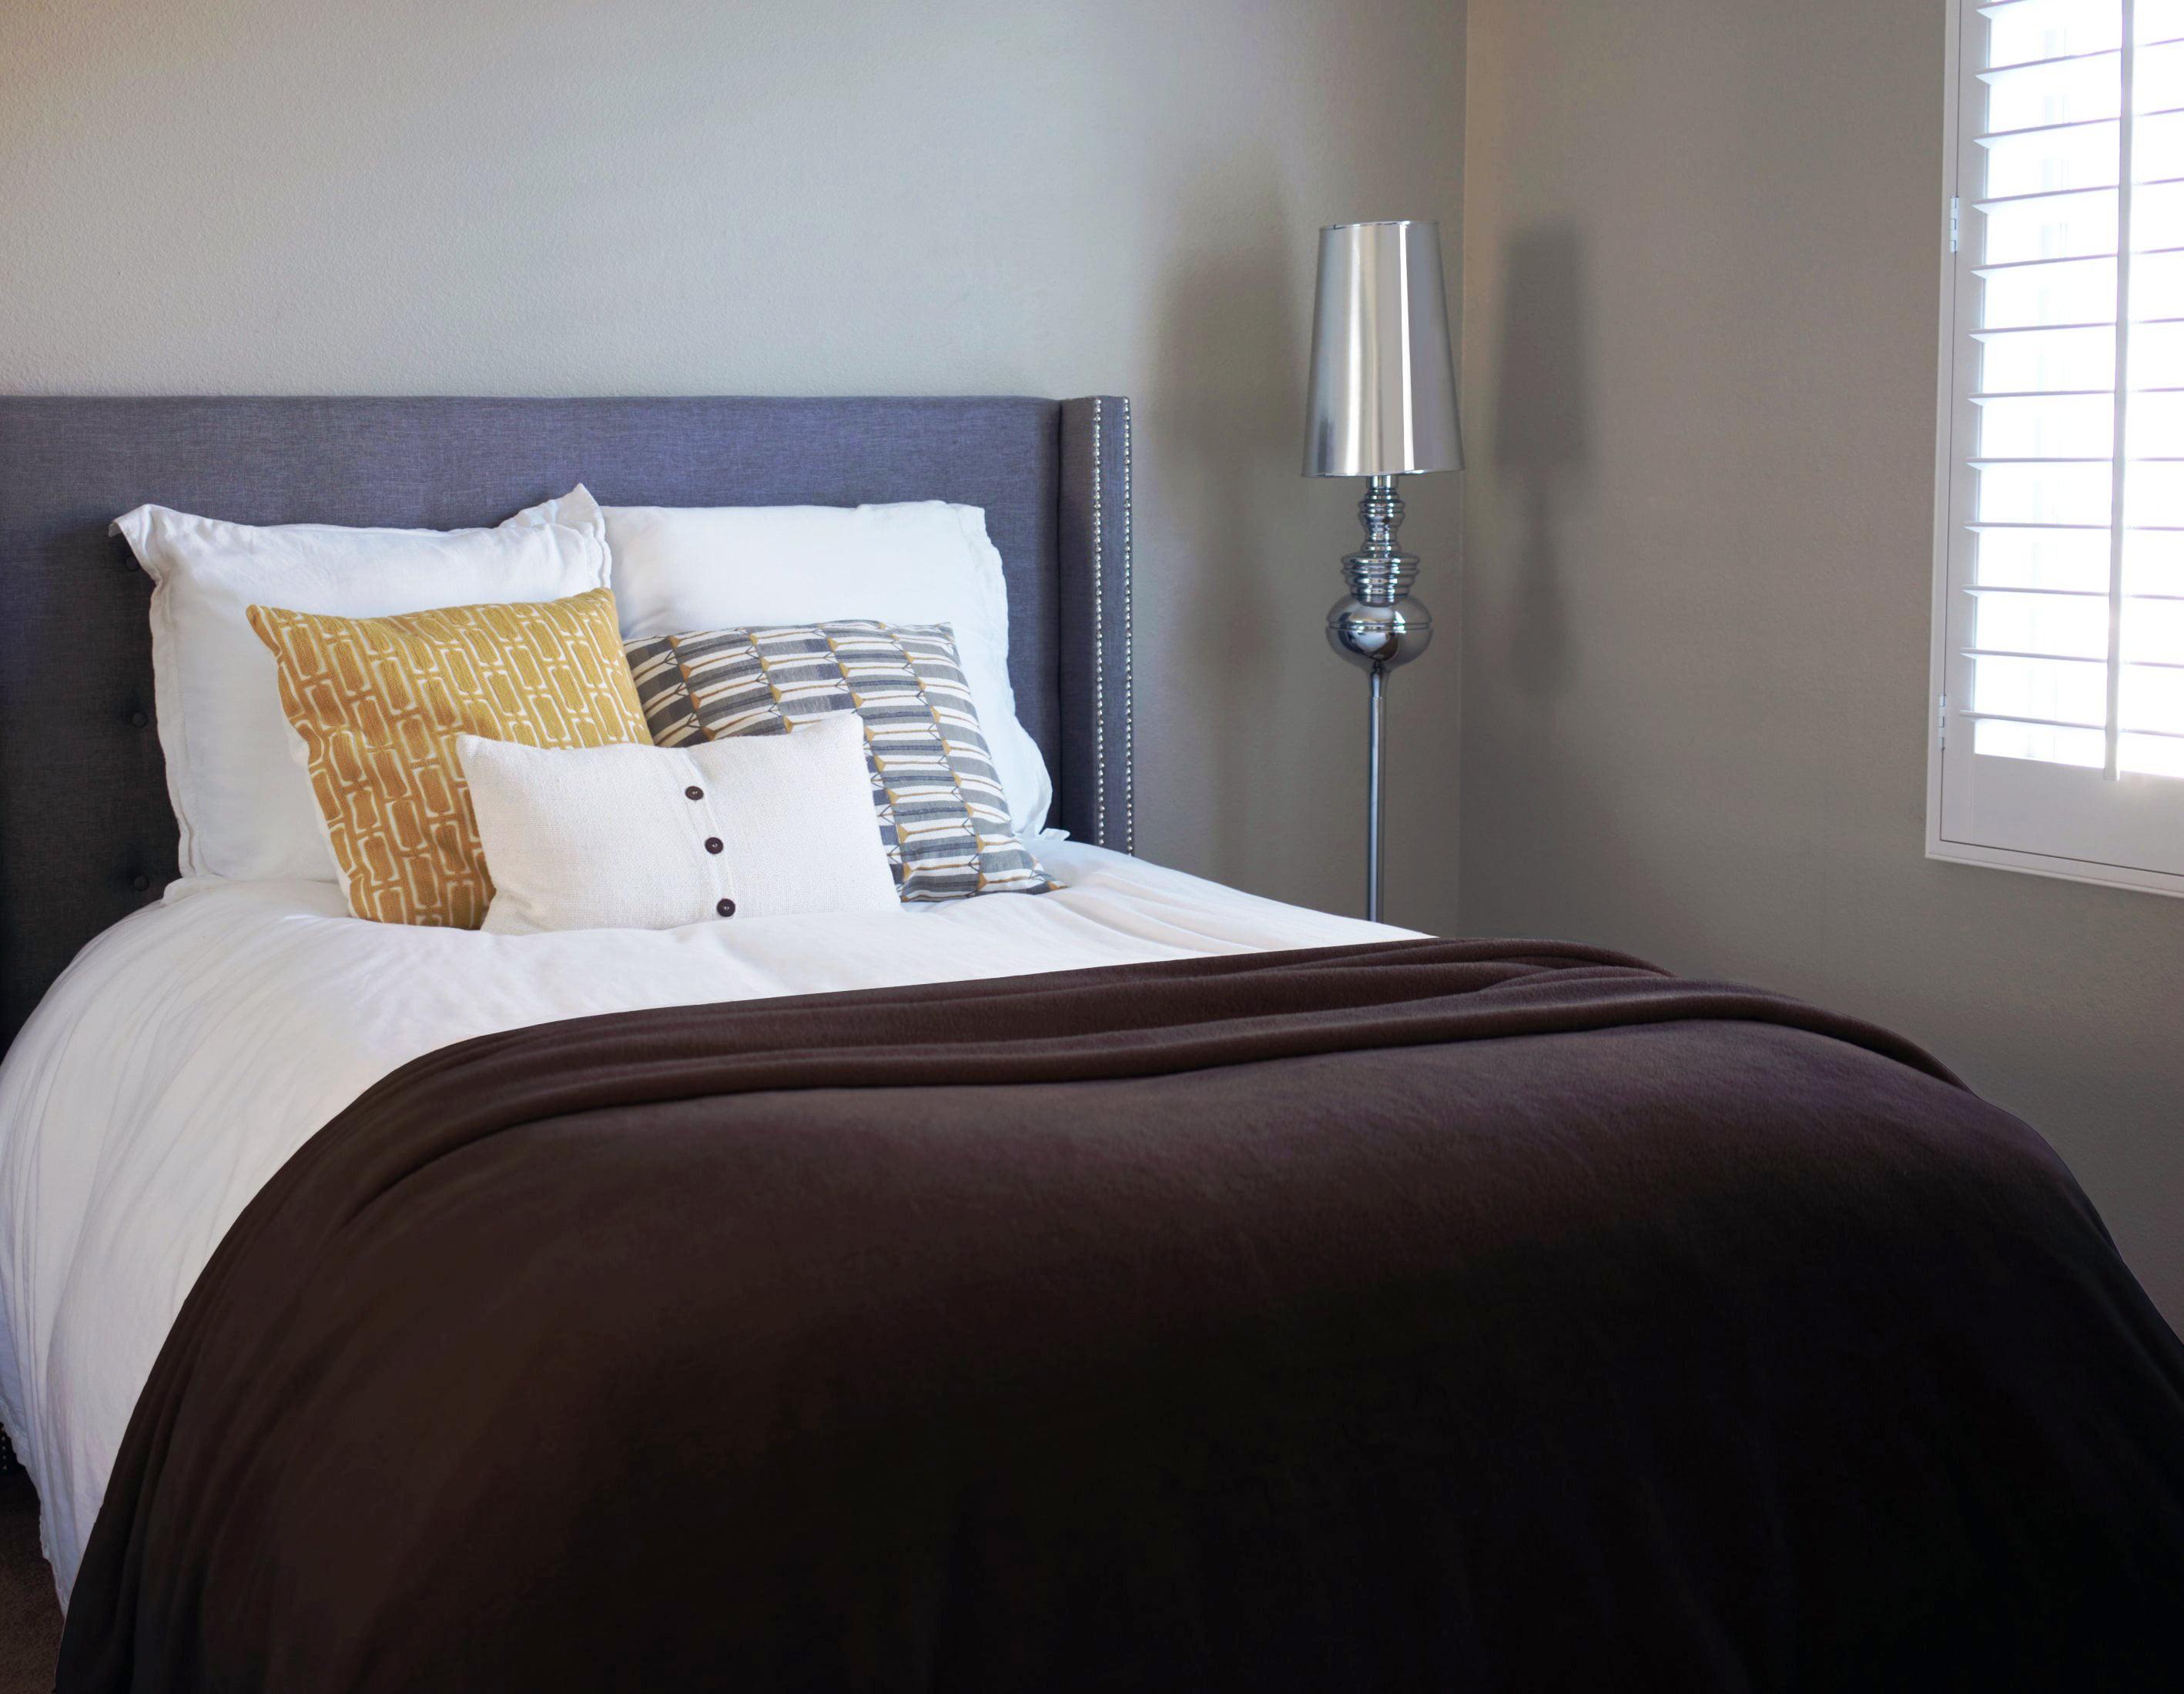 Napa All Season Super Soft Cozy Microplush Velvet Throw Blankets, Bed Blanket, Lightweight... by Napa